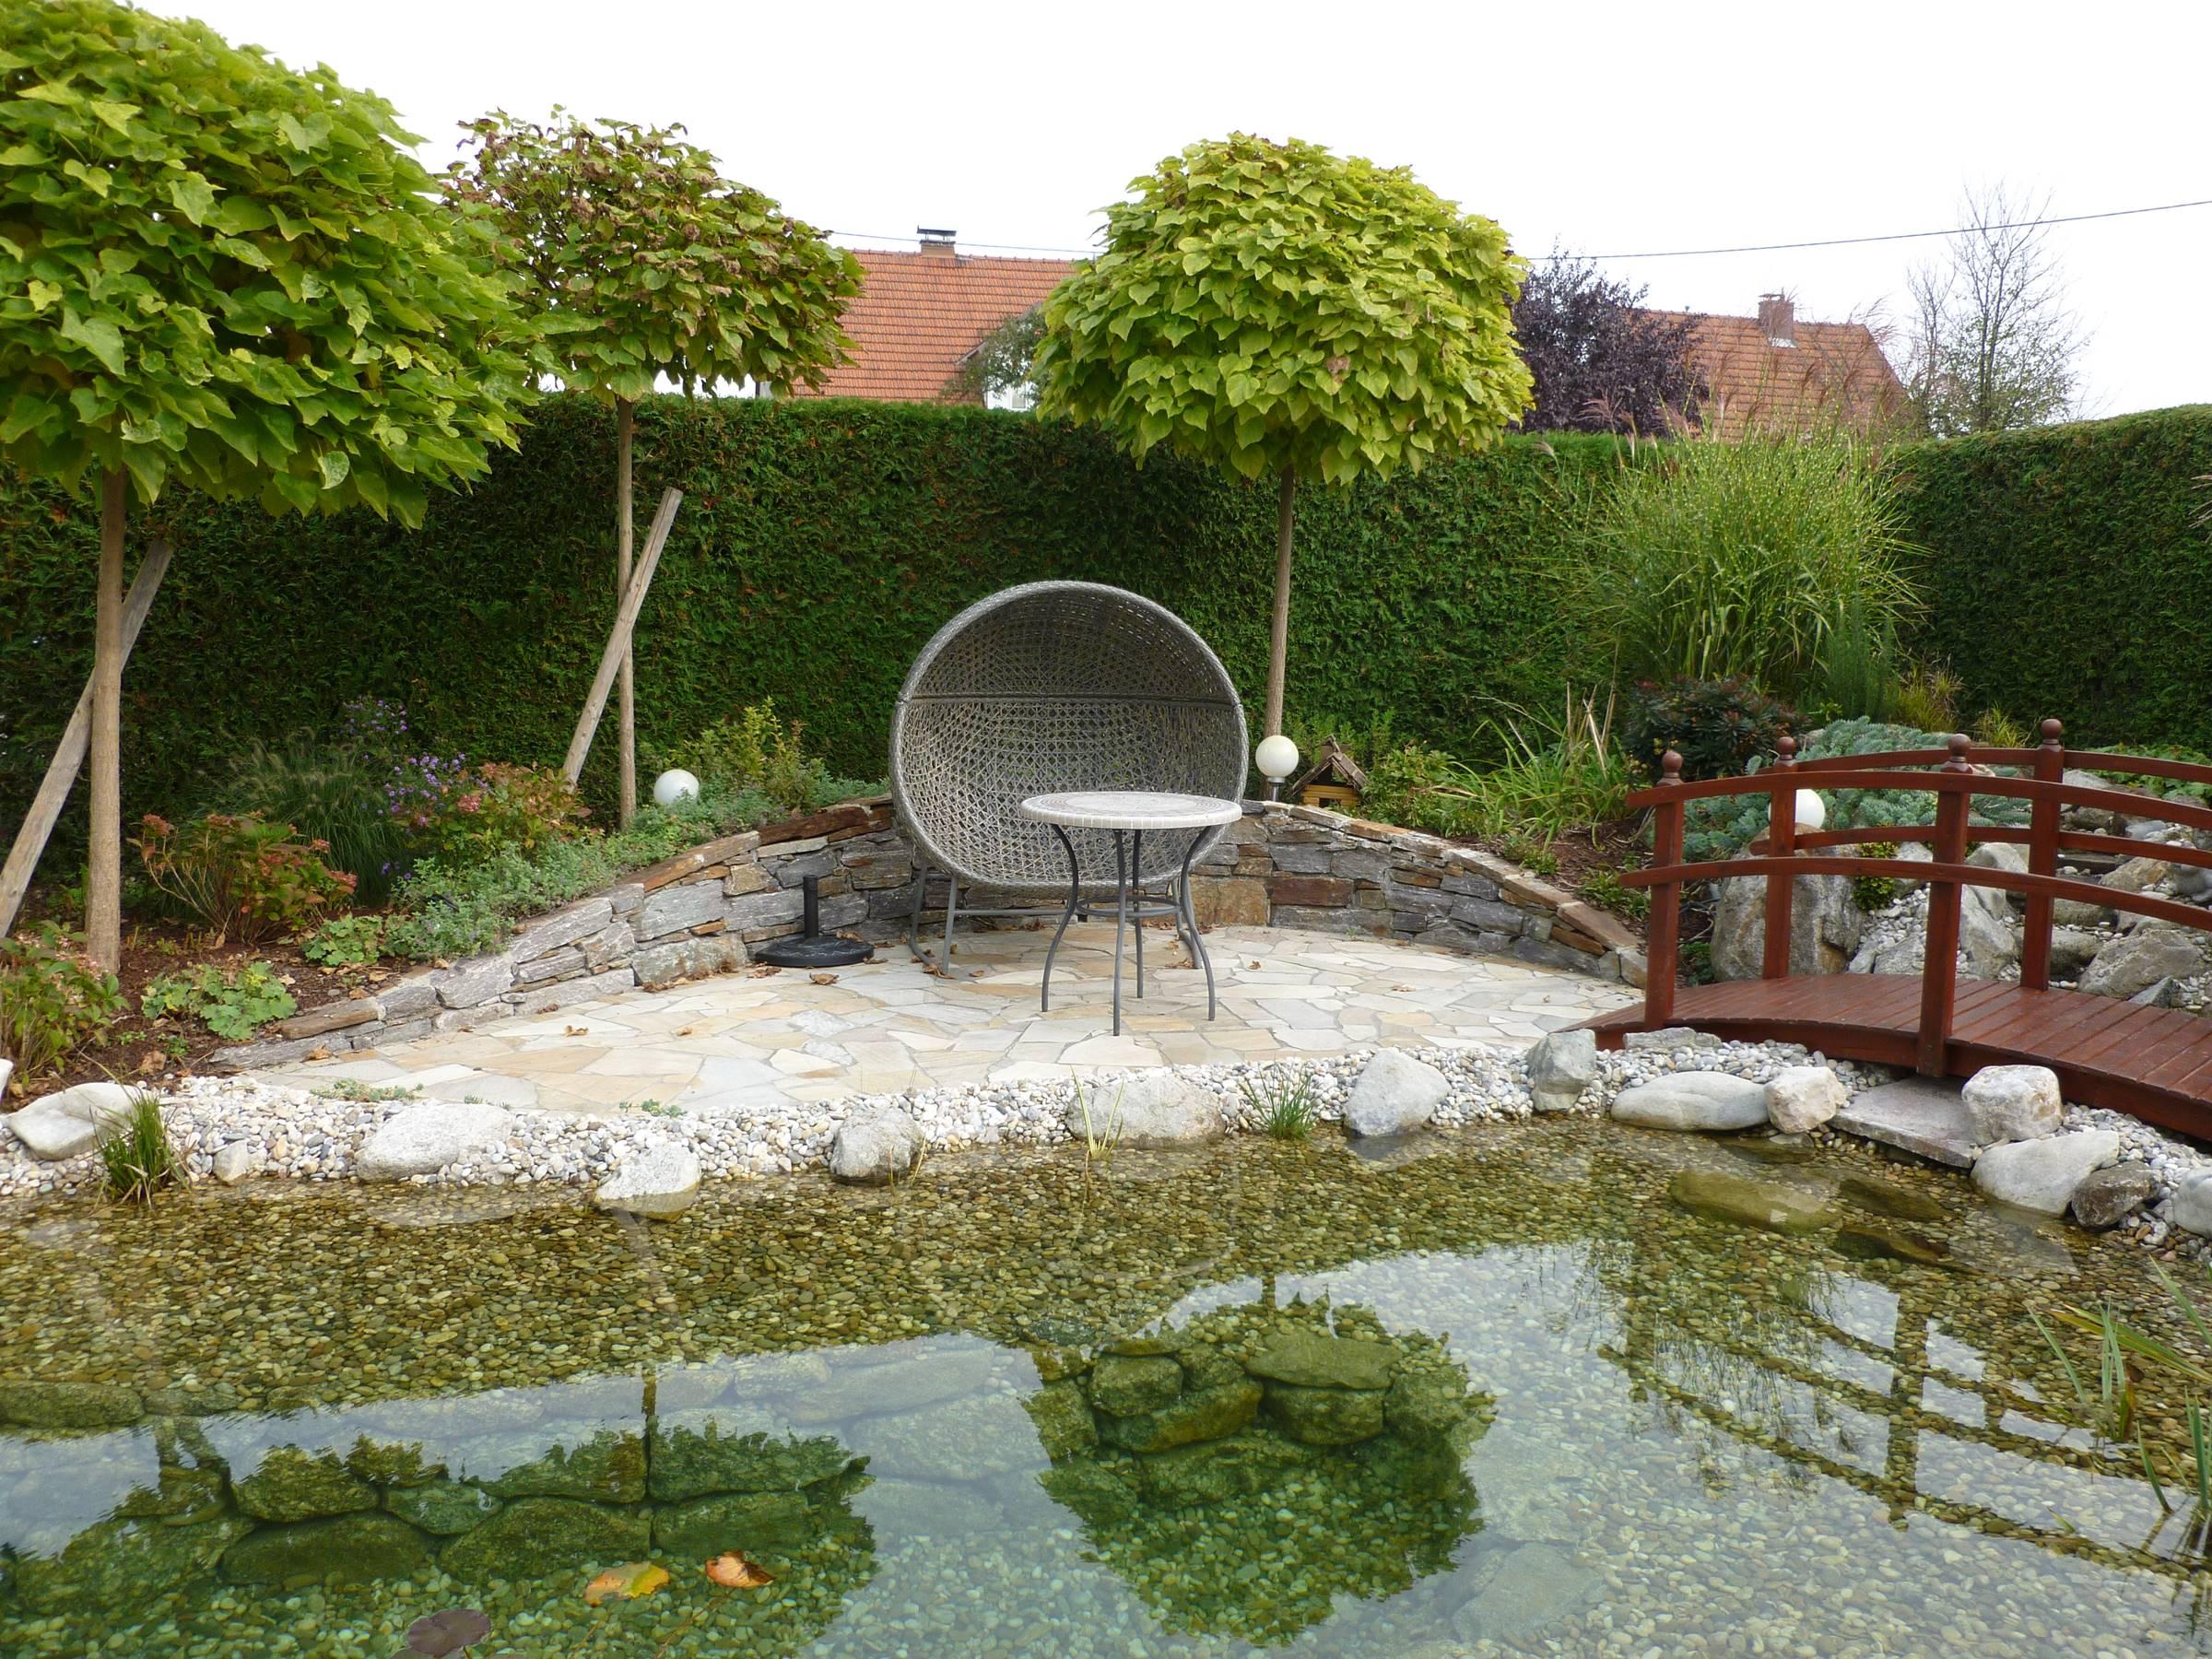 Wundervoll Gartengestaltung Oberhuber   Ihr Gärtner In Linz OÖ